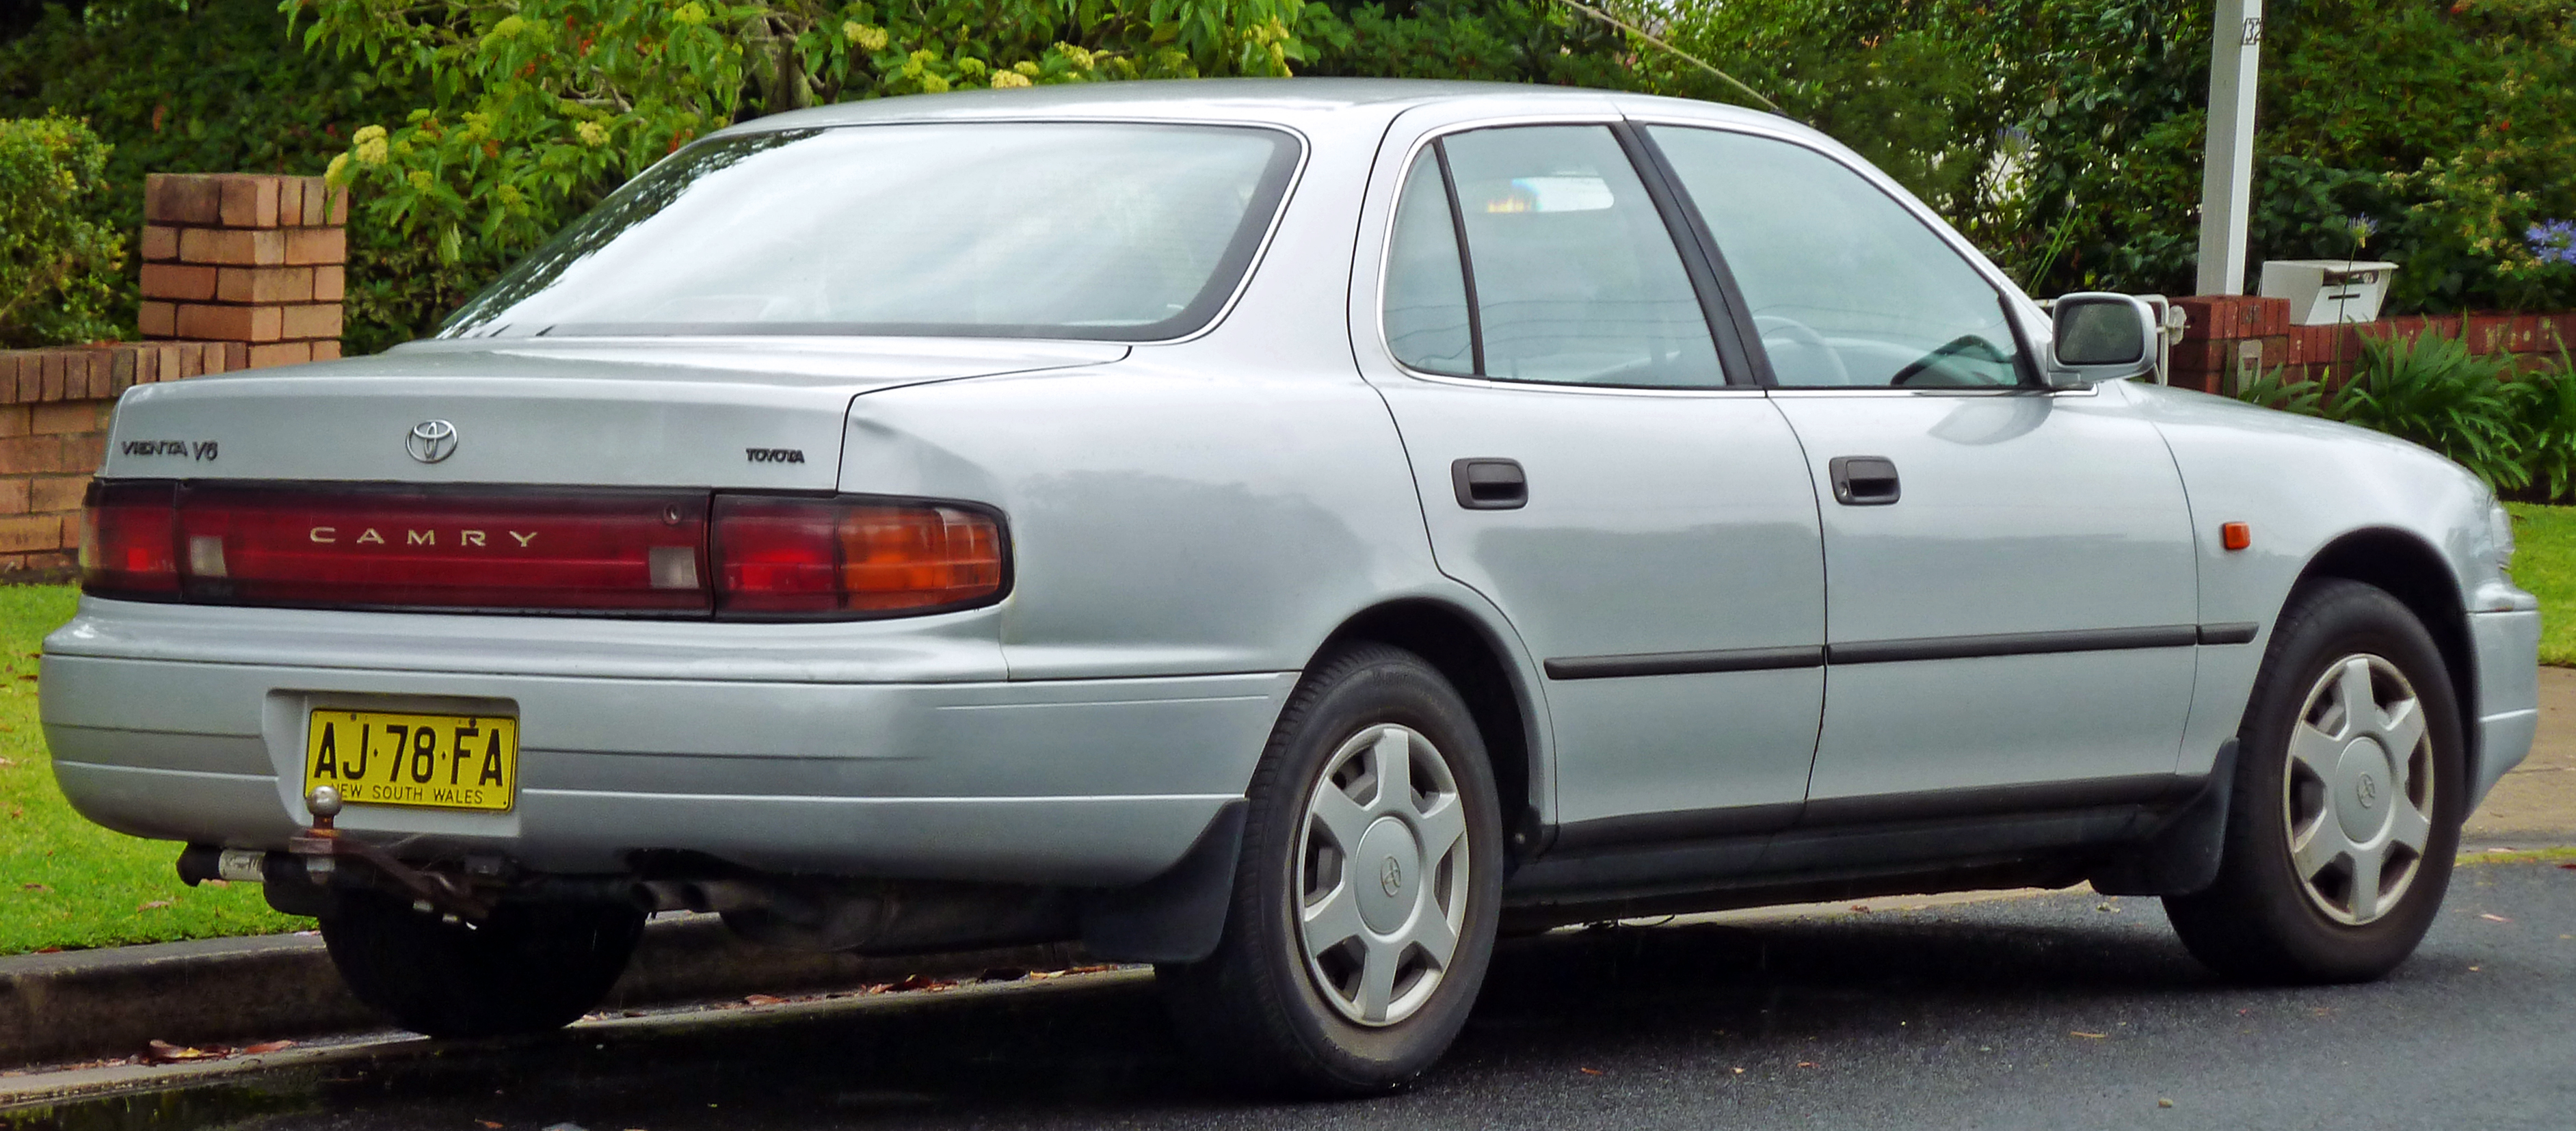 File 1994 1995 Toyota Camry Vienta Vdv10 Csx Sedan 02